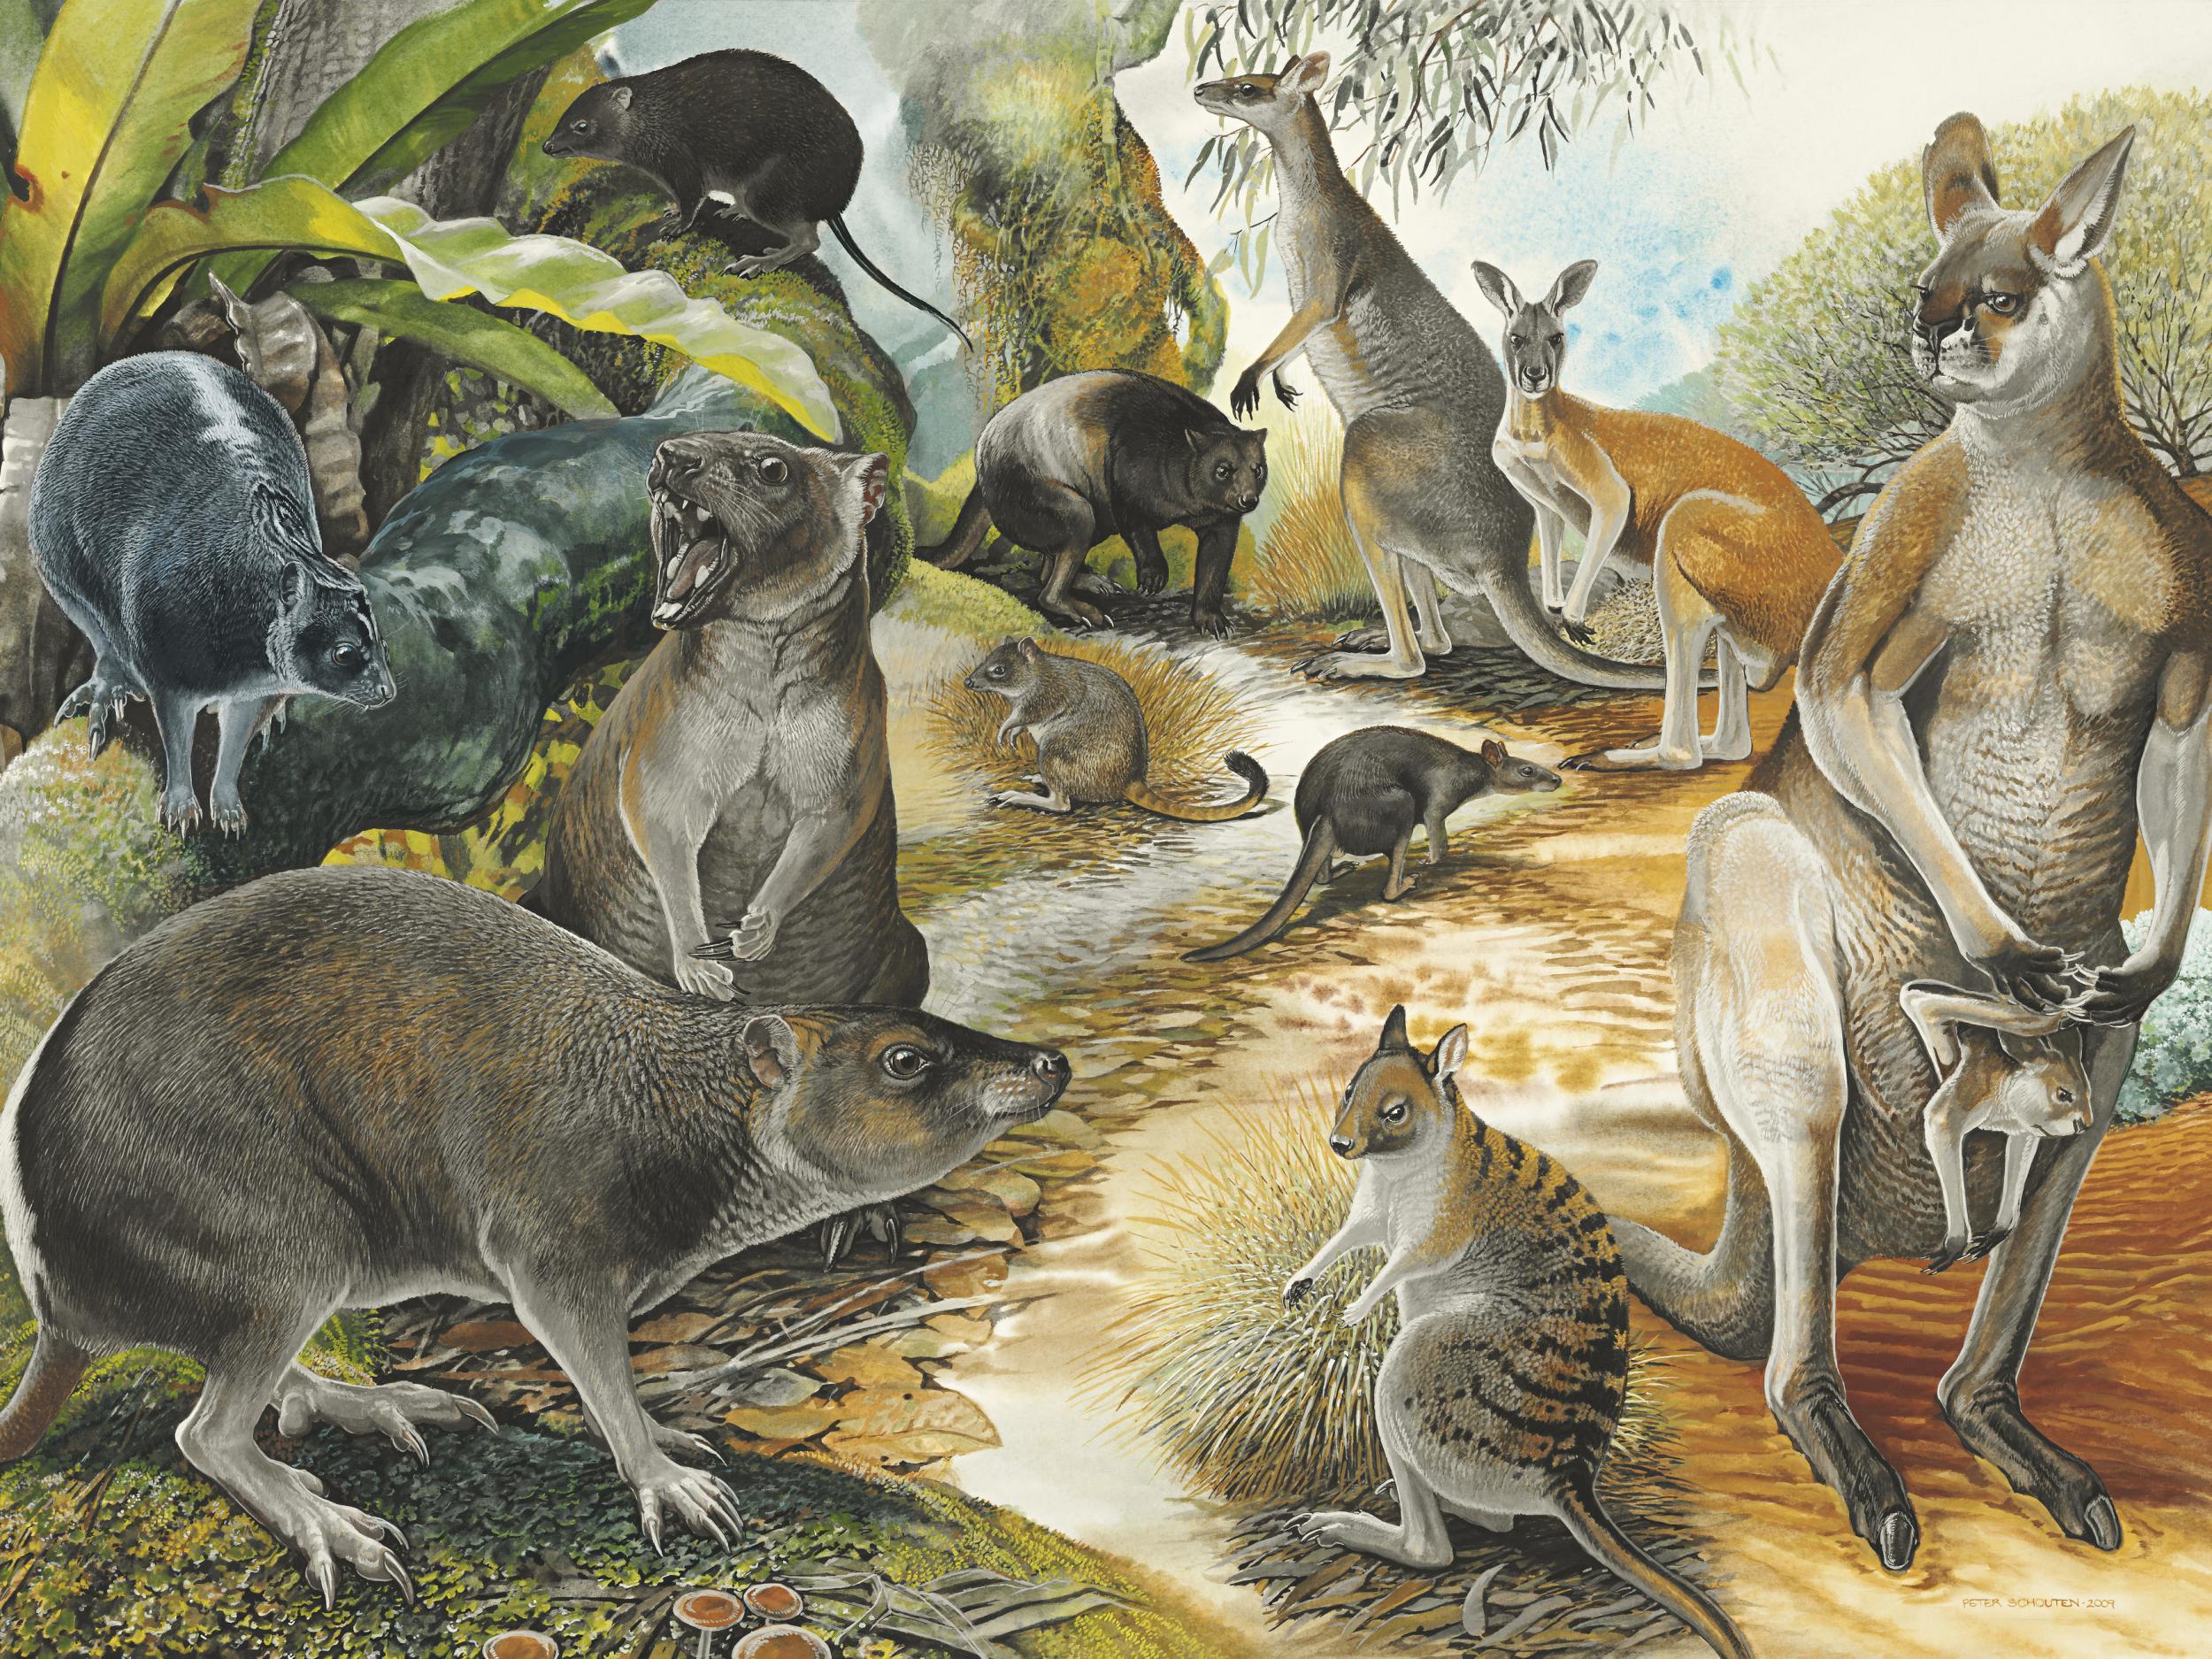 Ancient kangaroo fossil reveals origin of marsupial hop